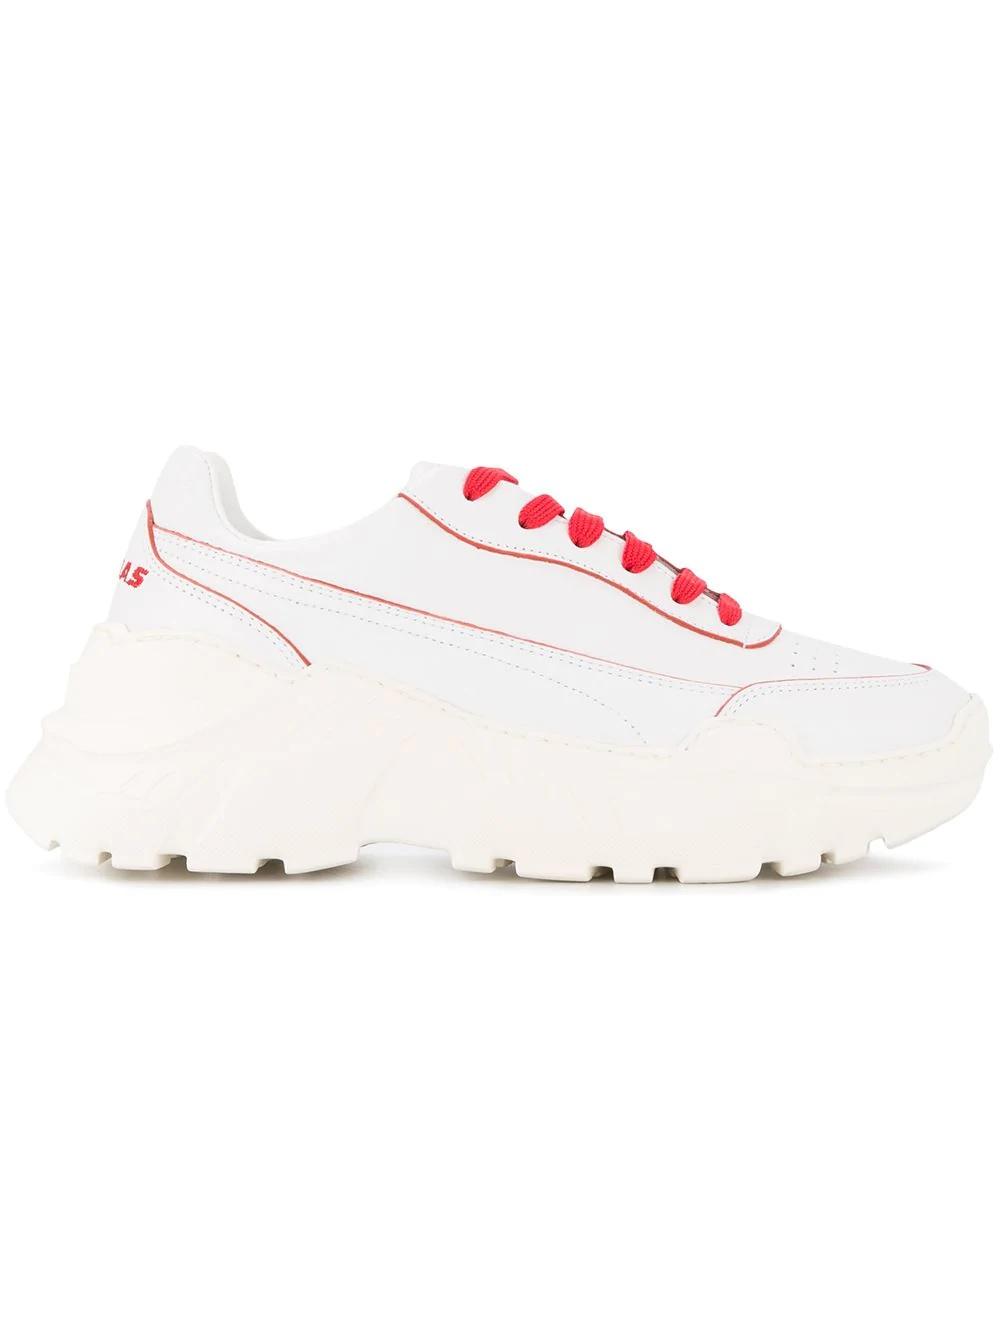 JOSHUA SANDERSS  老爹時尚球鞋(紅線)